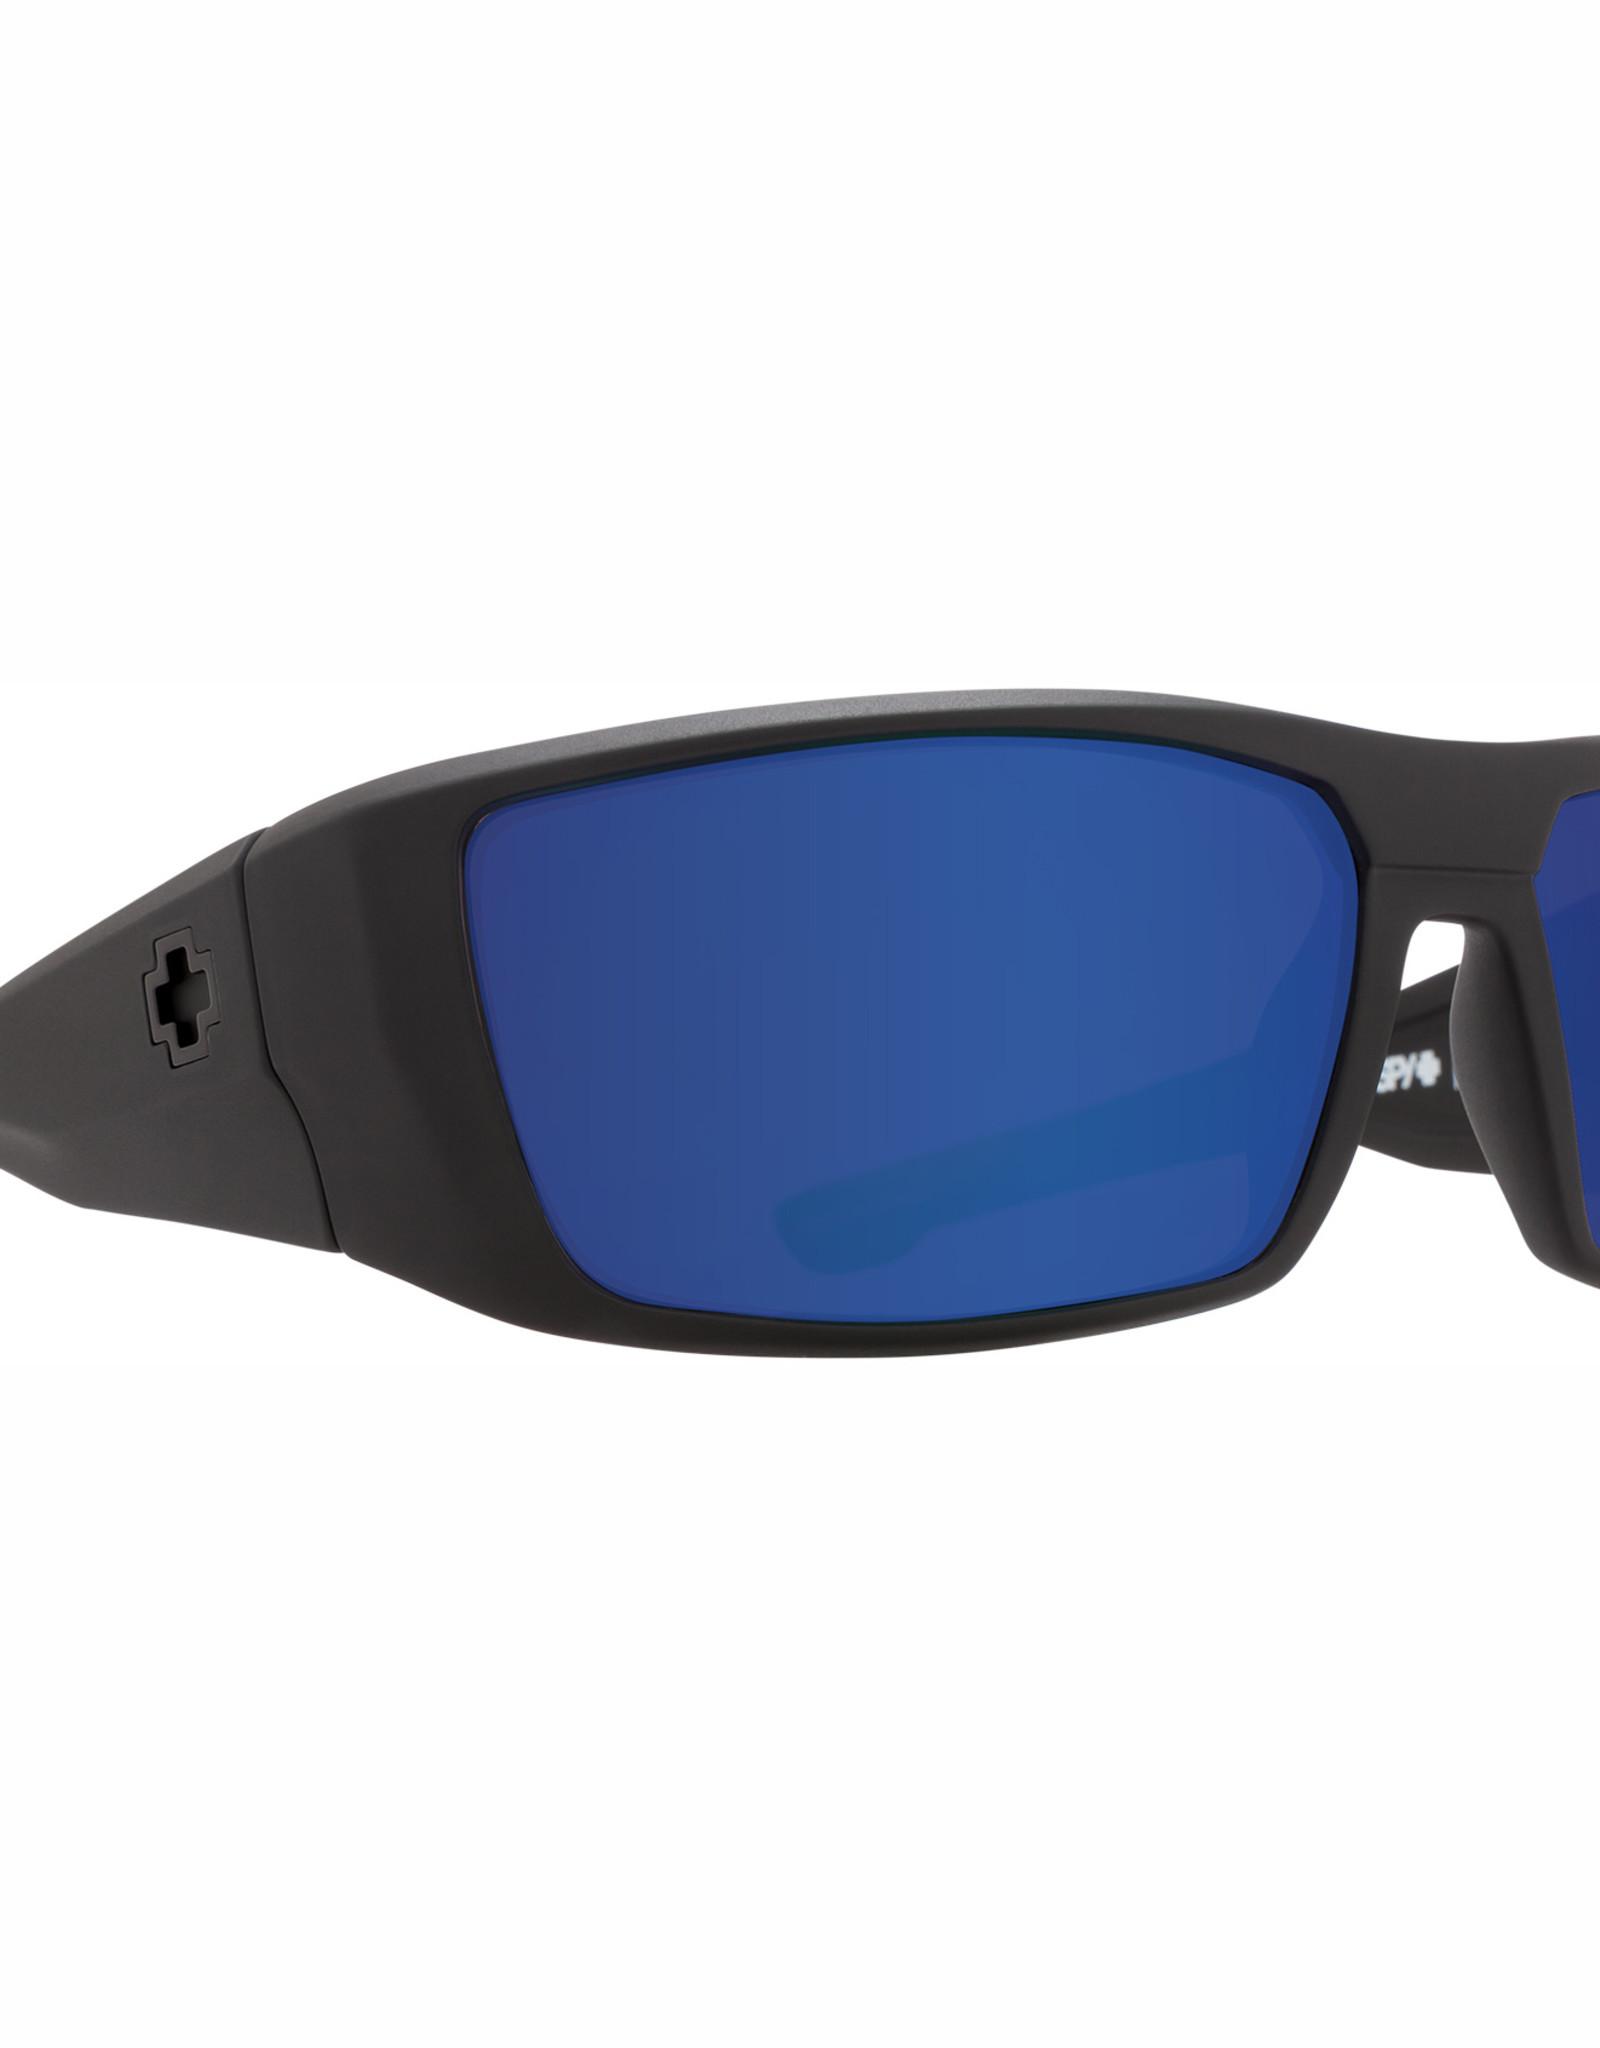 Spy Dirk Matte Black HD Plus Bronze Polar with Blue Spectra Mirror